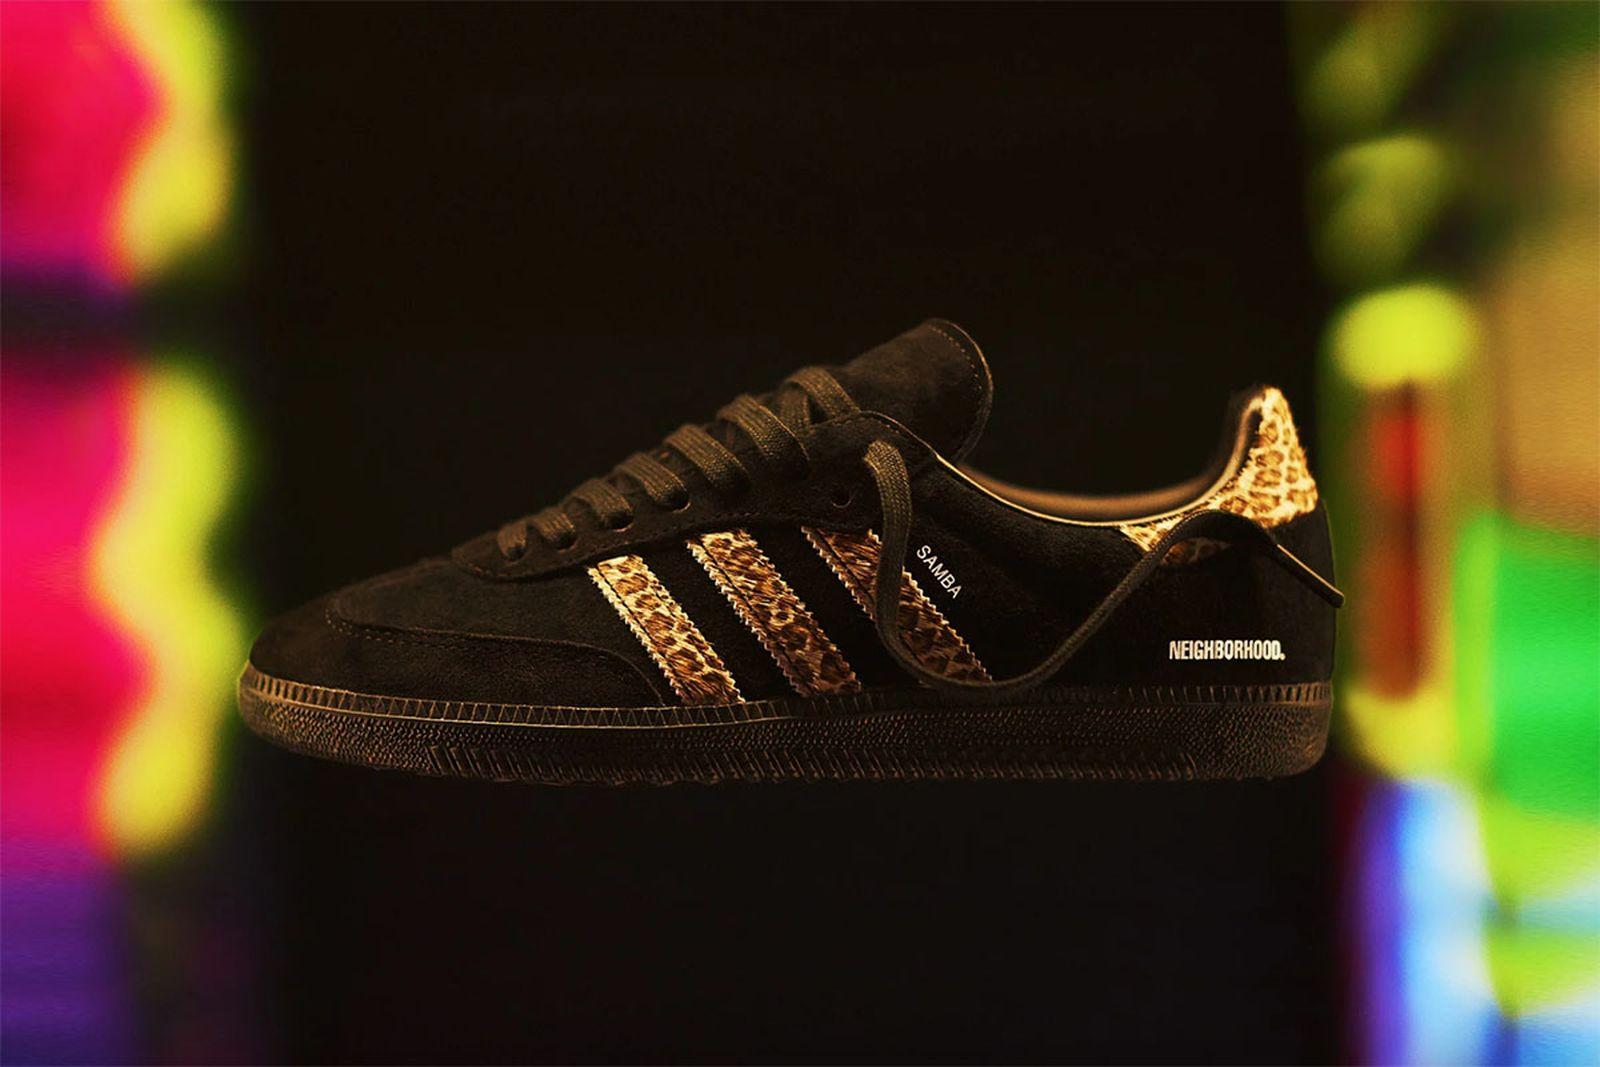 neighborhood-end-adidas-summer-2021-release-date-price-12